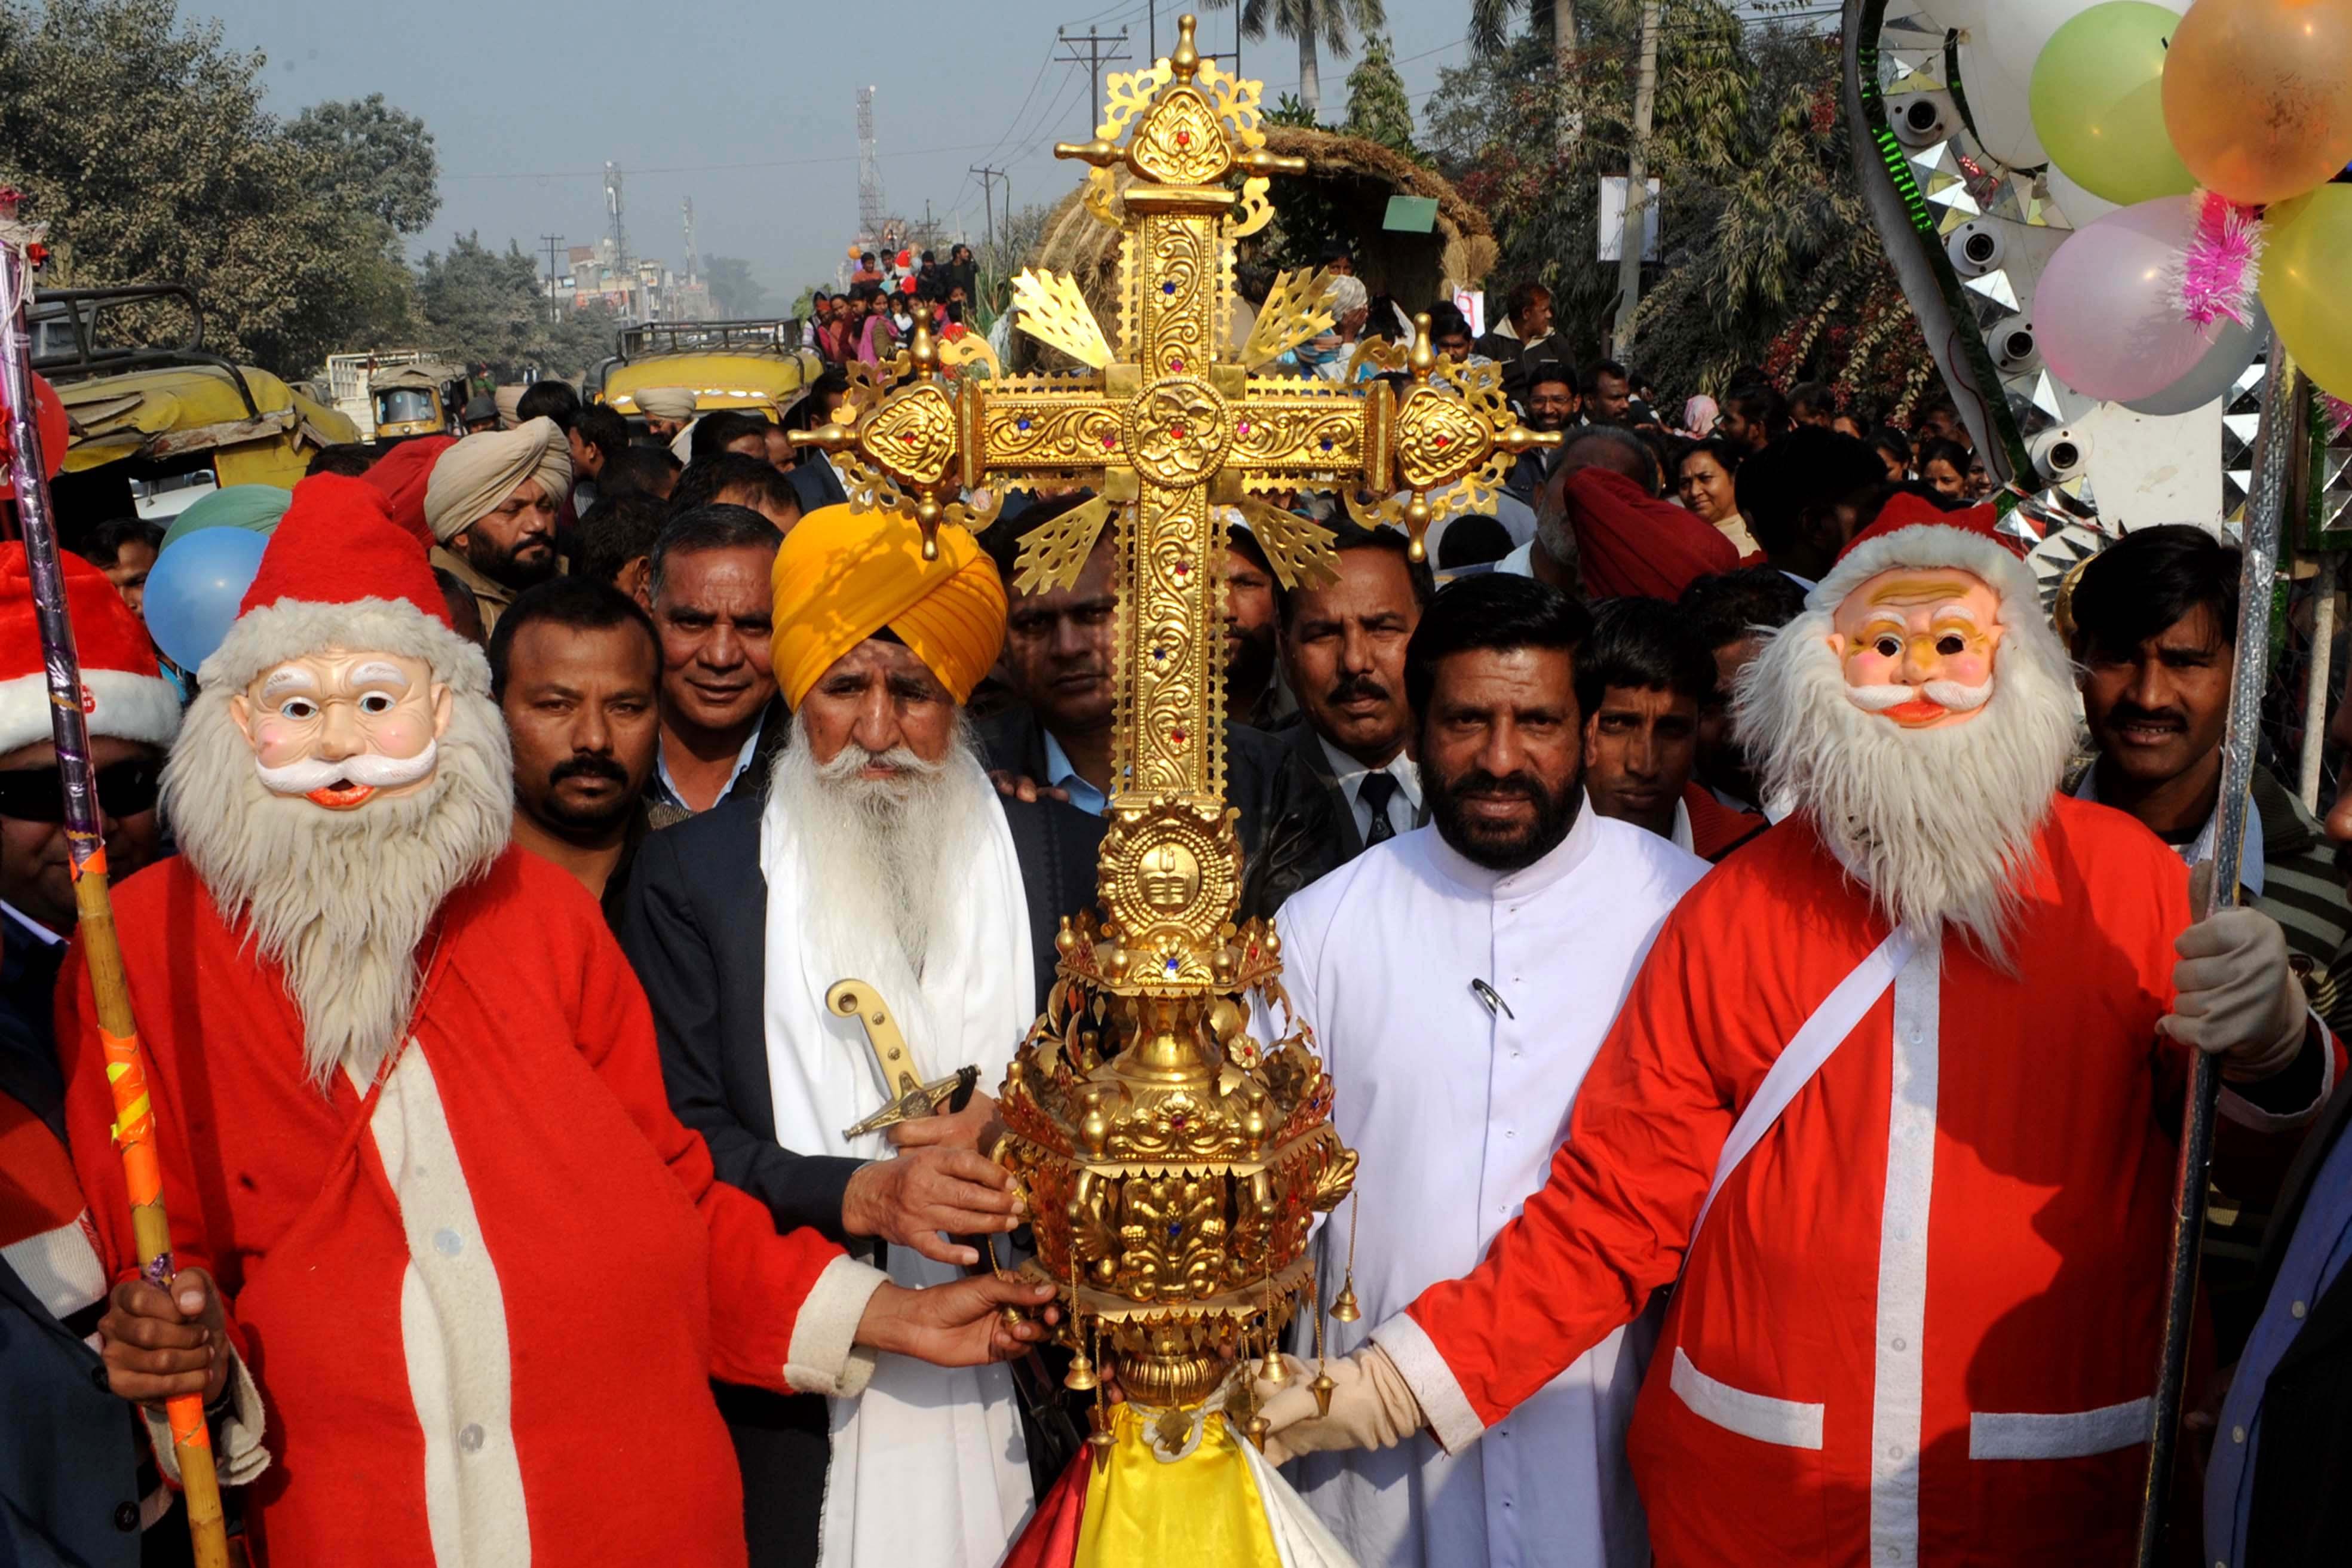 Ethnic christmas pics, kristin cavallari nude fakes